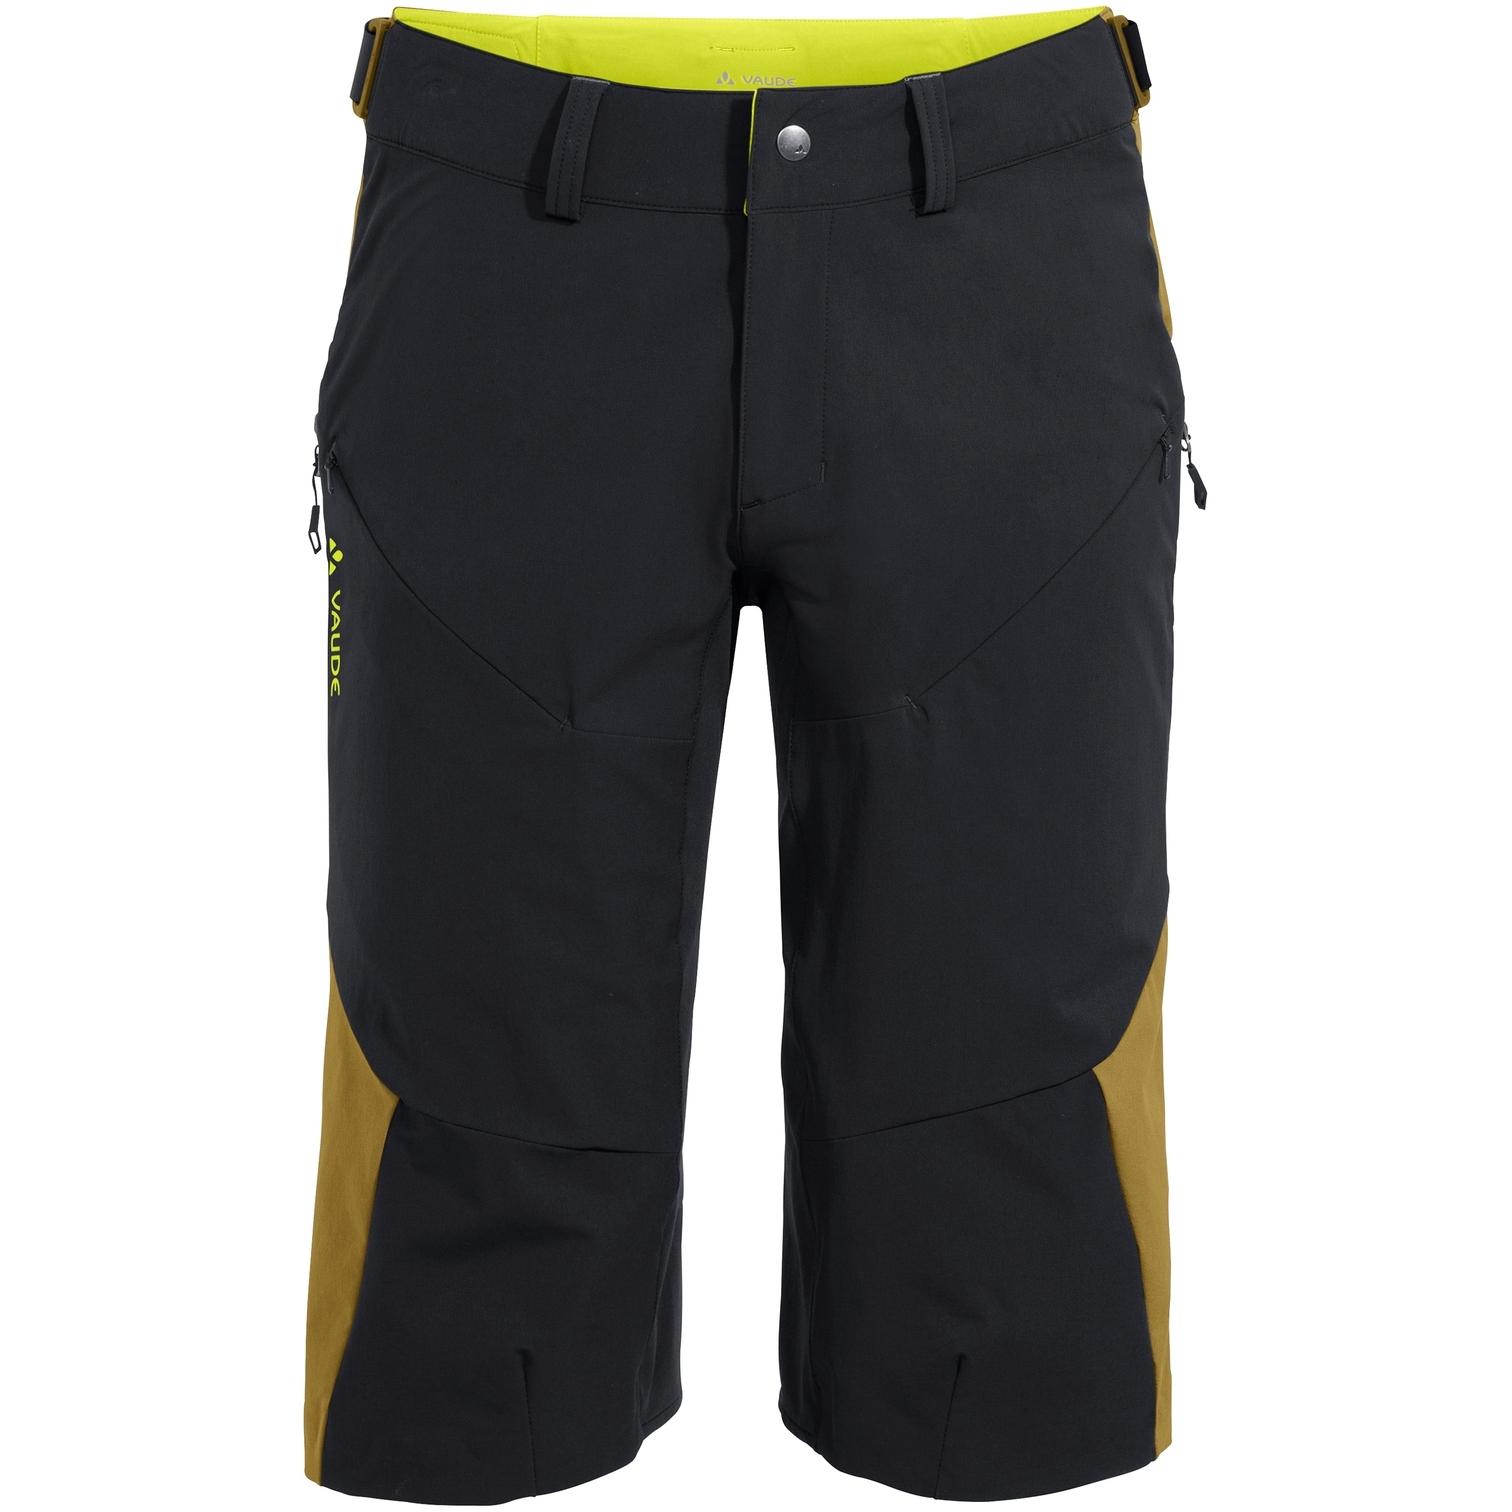 Vaude Moab MTB-Shorts IV - black